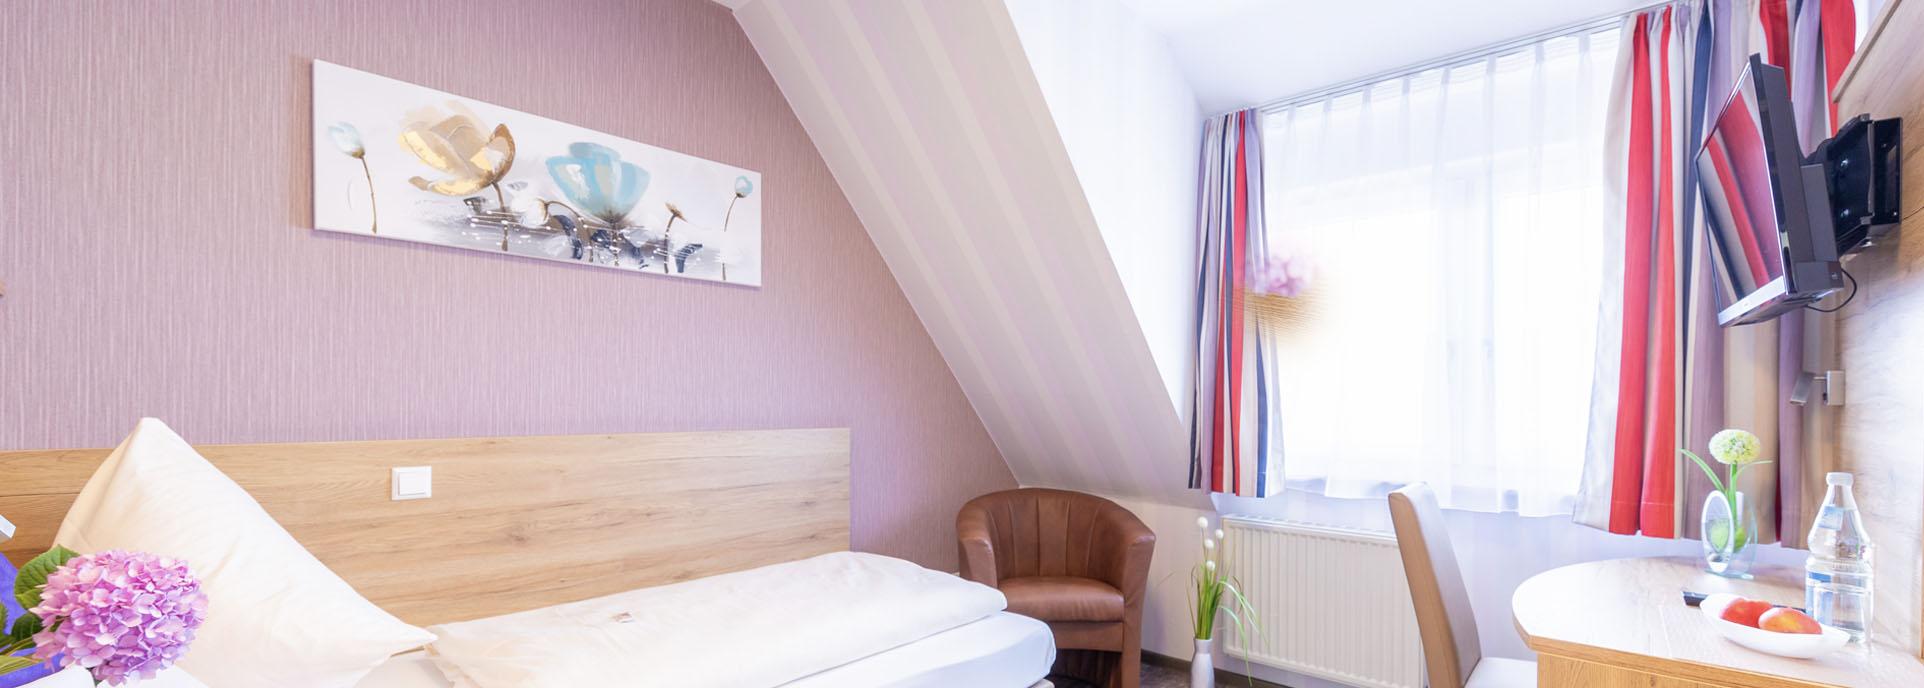 hotel_reinhardtshof_slide_09